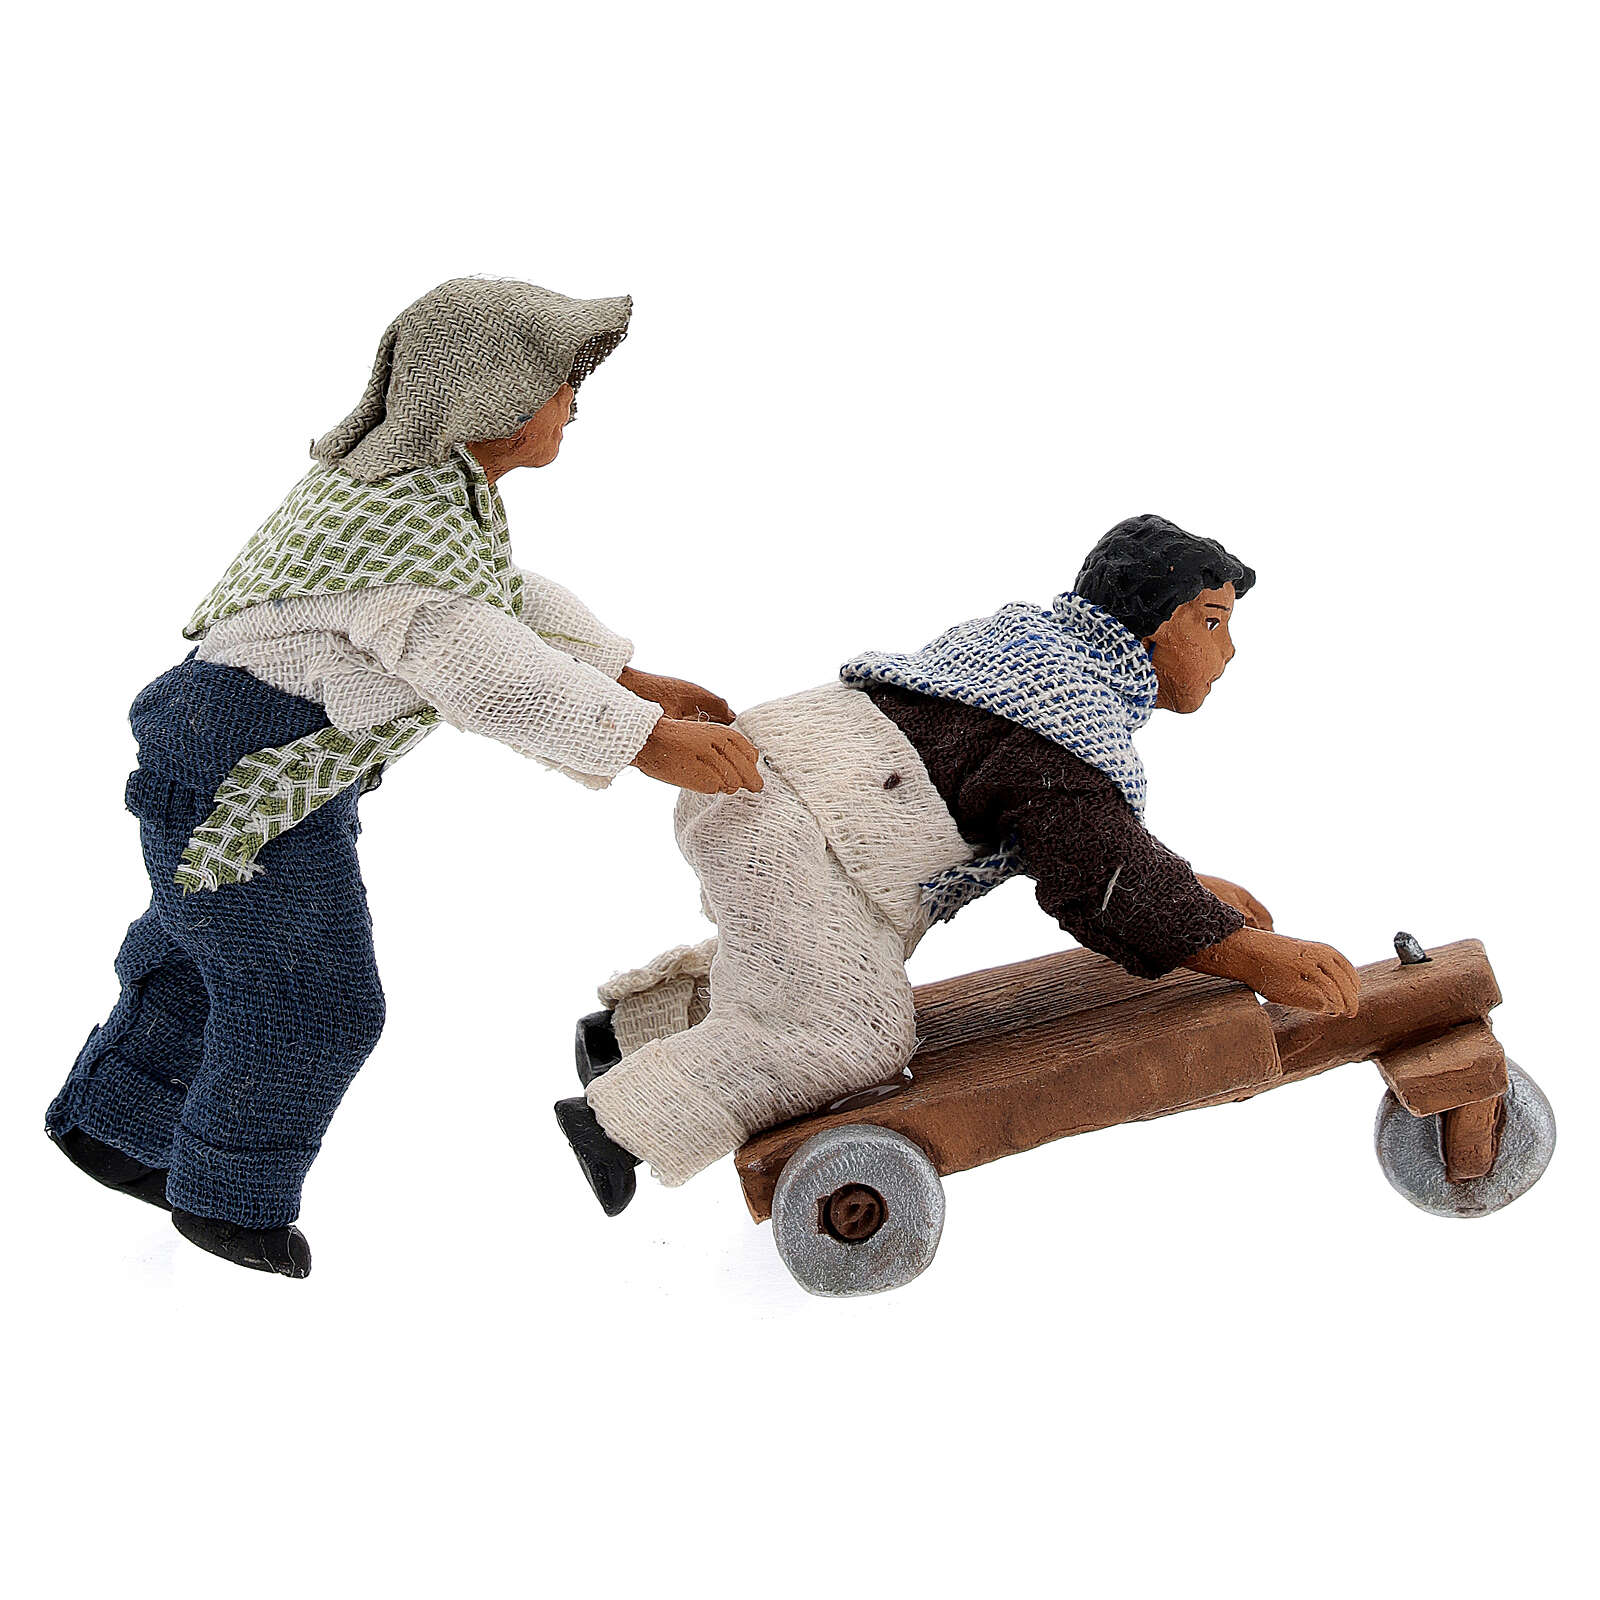 Pair of children playing with cart Neapolitan Nativity Scene figurine 10 cm 4